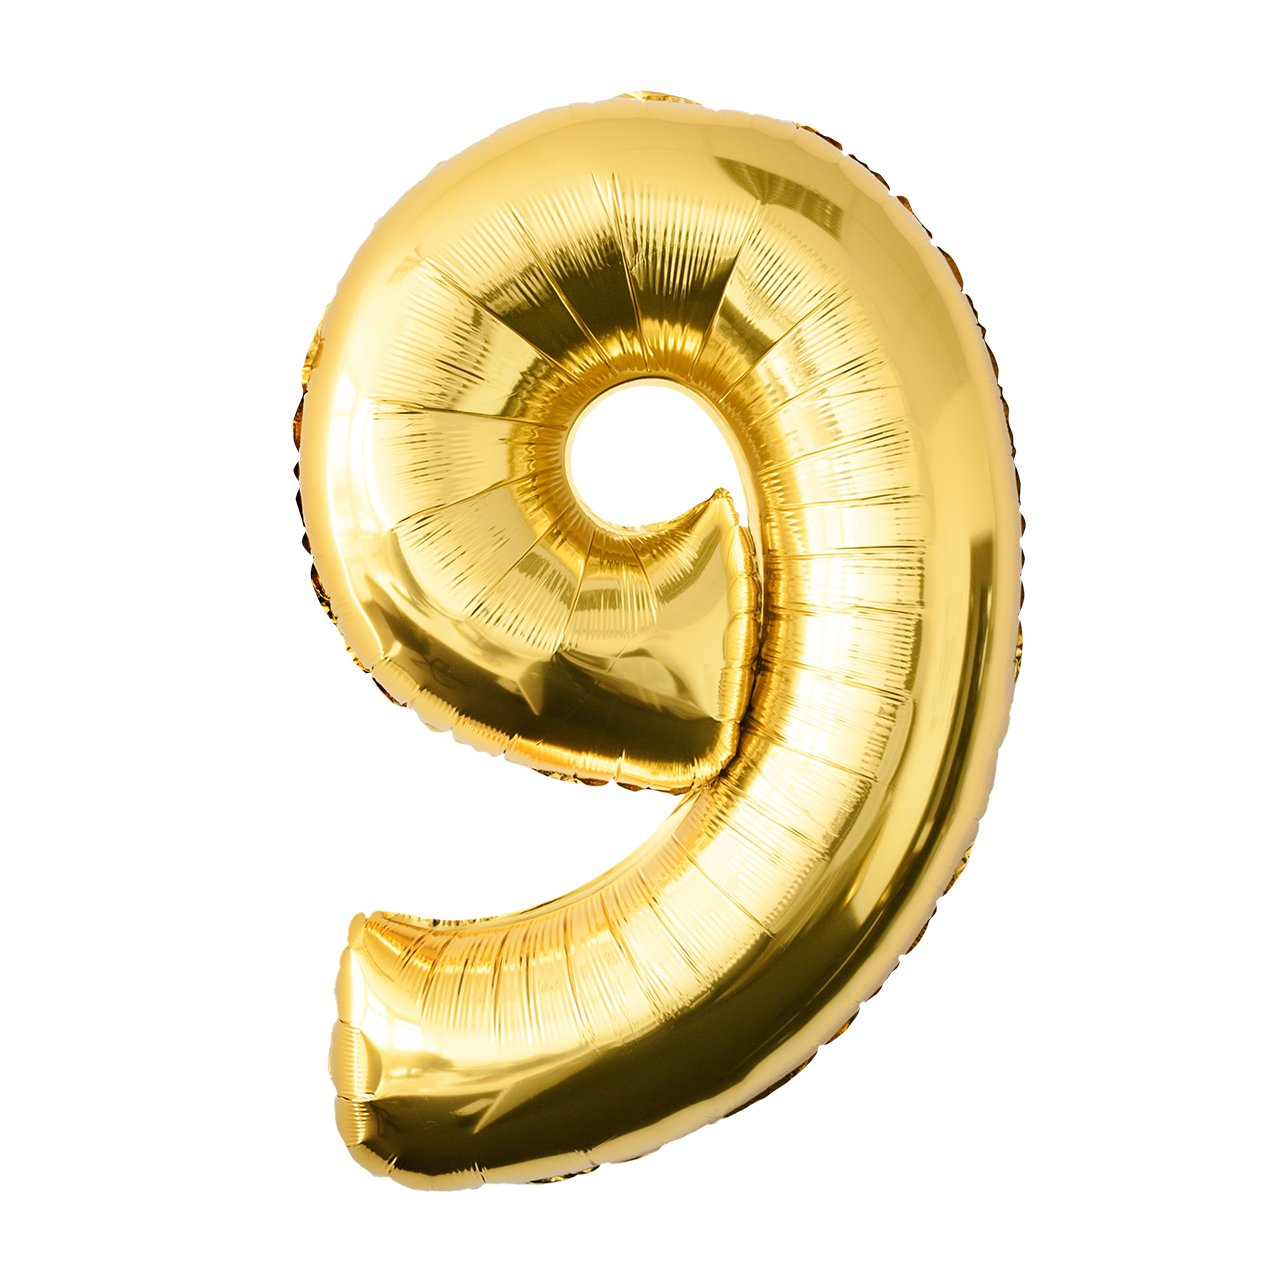 Folienballon Zahl 8 Nummer Luftballon Kindergeburtstag Geburtstag Gold 91x60